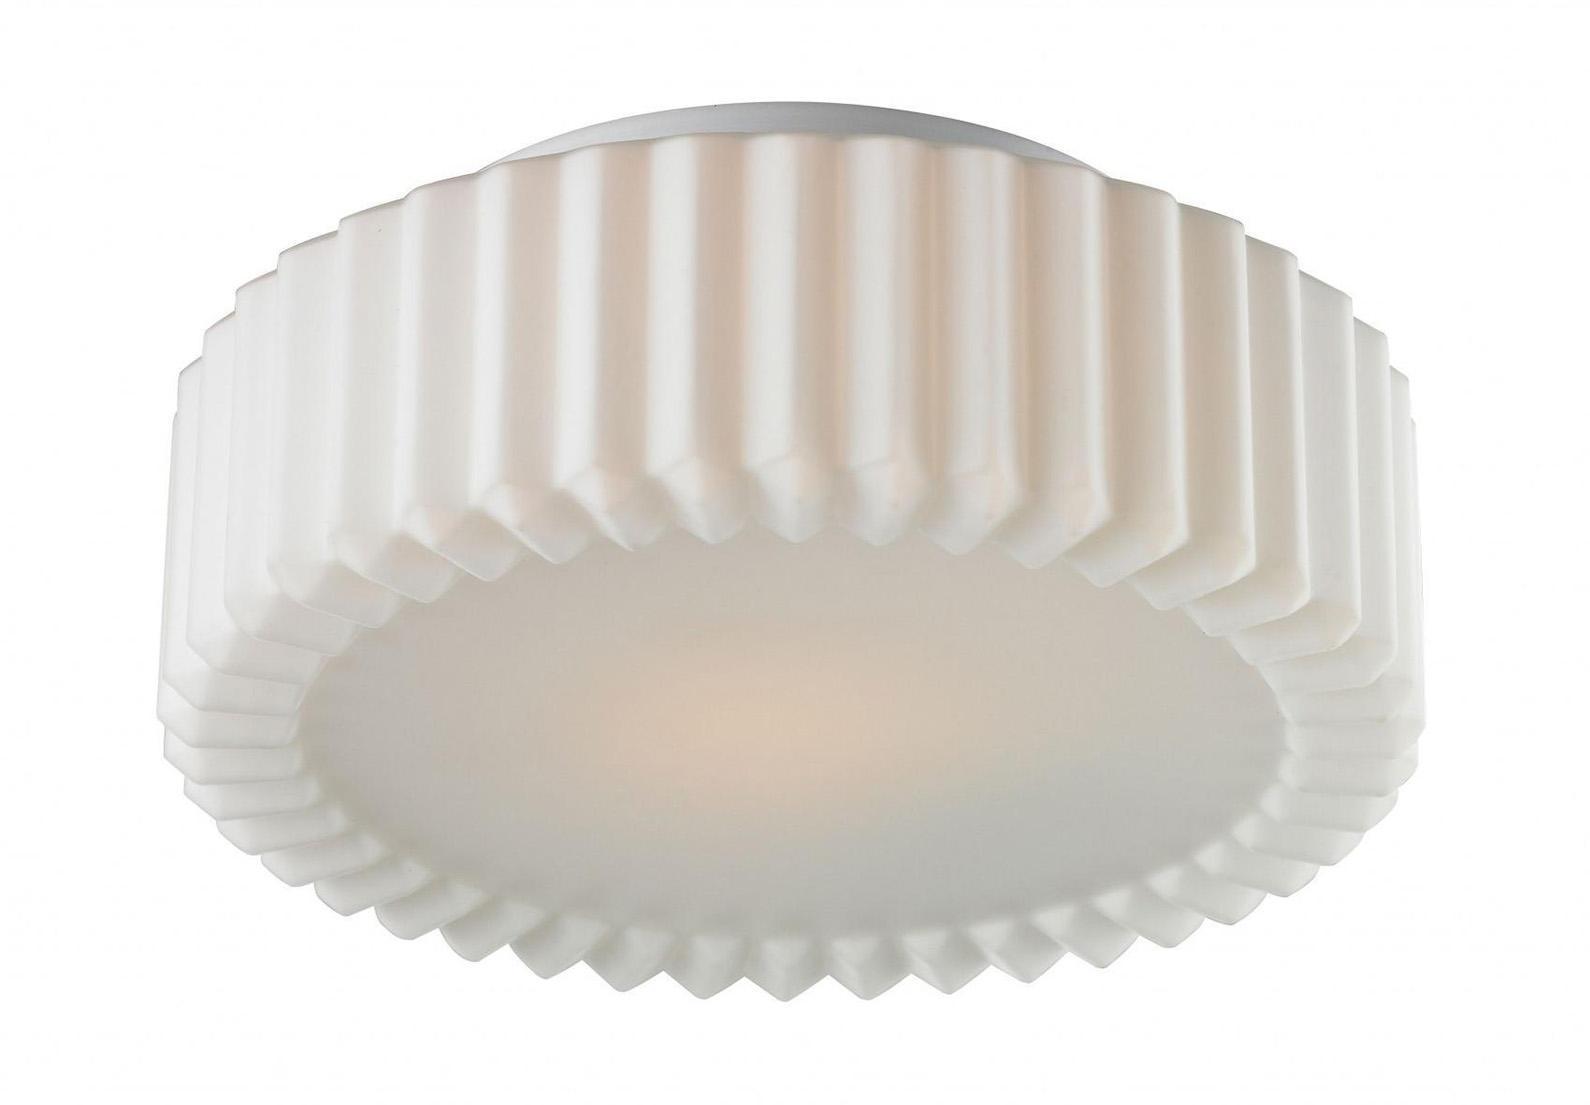 A5027PL-1WH AQUA Потолочный светильникA5027PL-1WHA5027PL-1WH AQUA Потолочный светильник